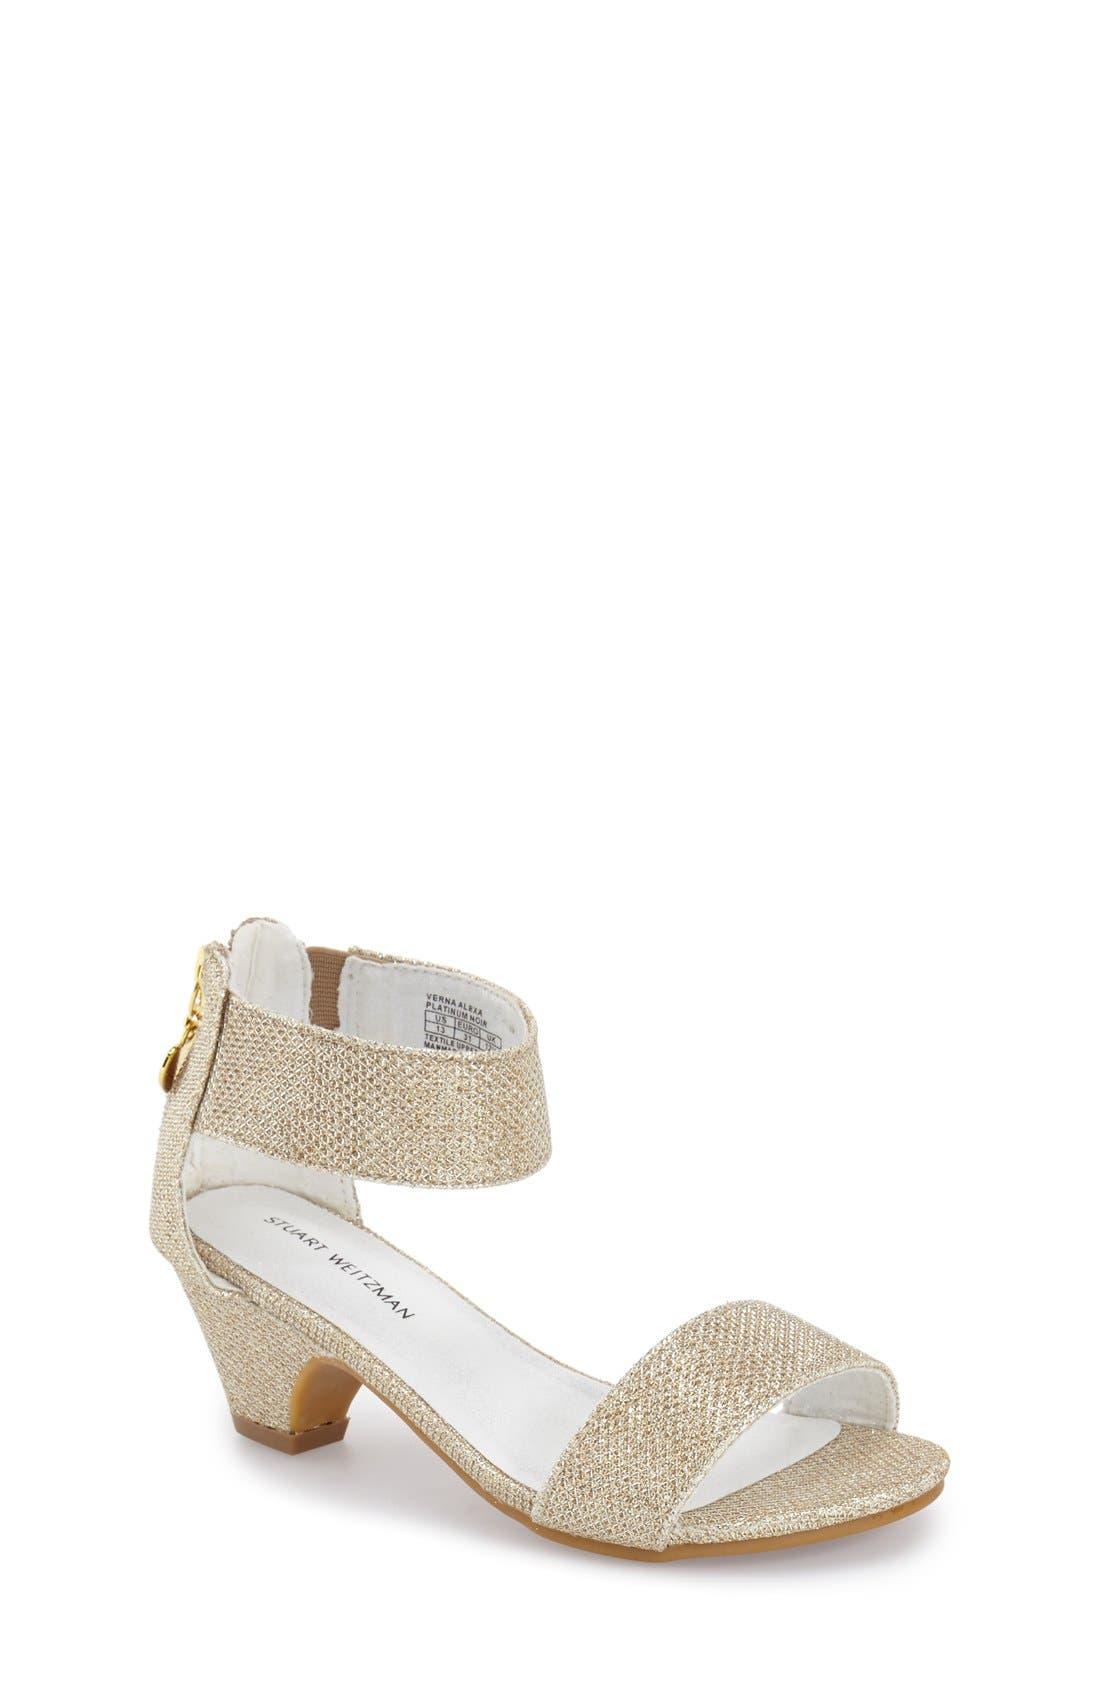 'Verna Alexa' Sandal,                         Main,                         color,